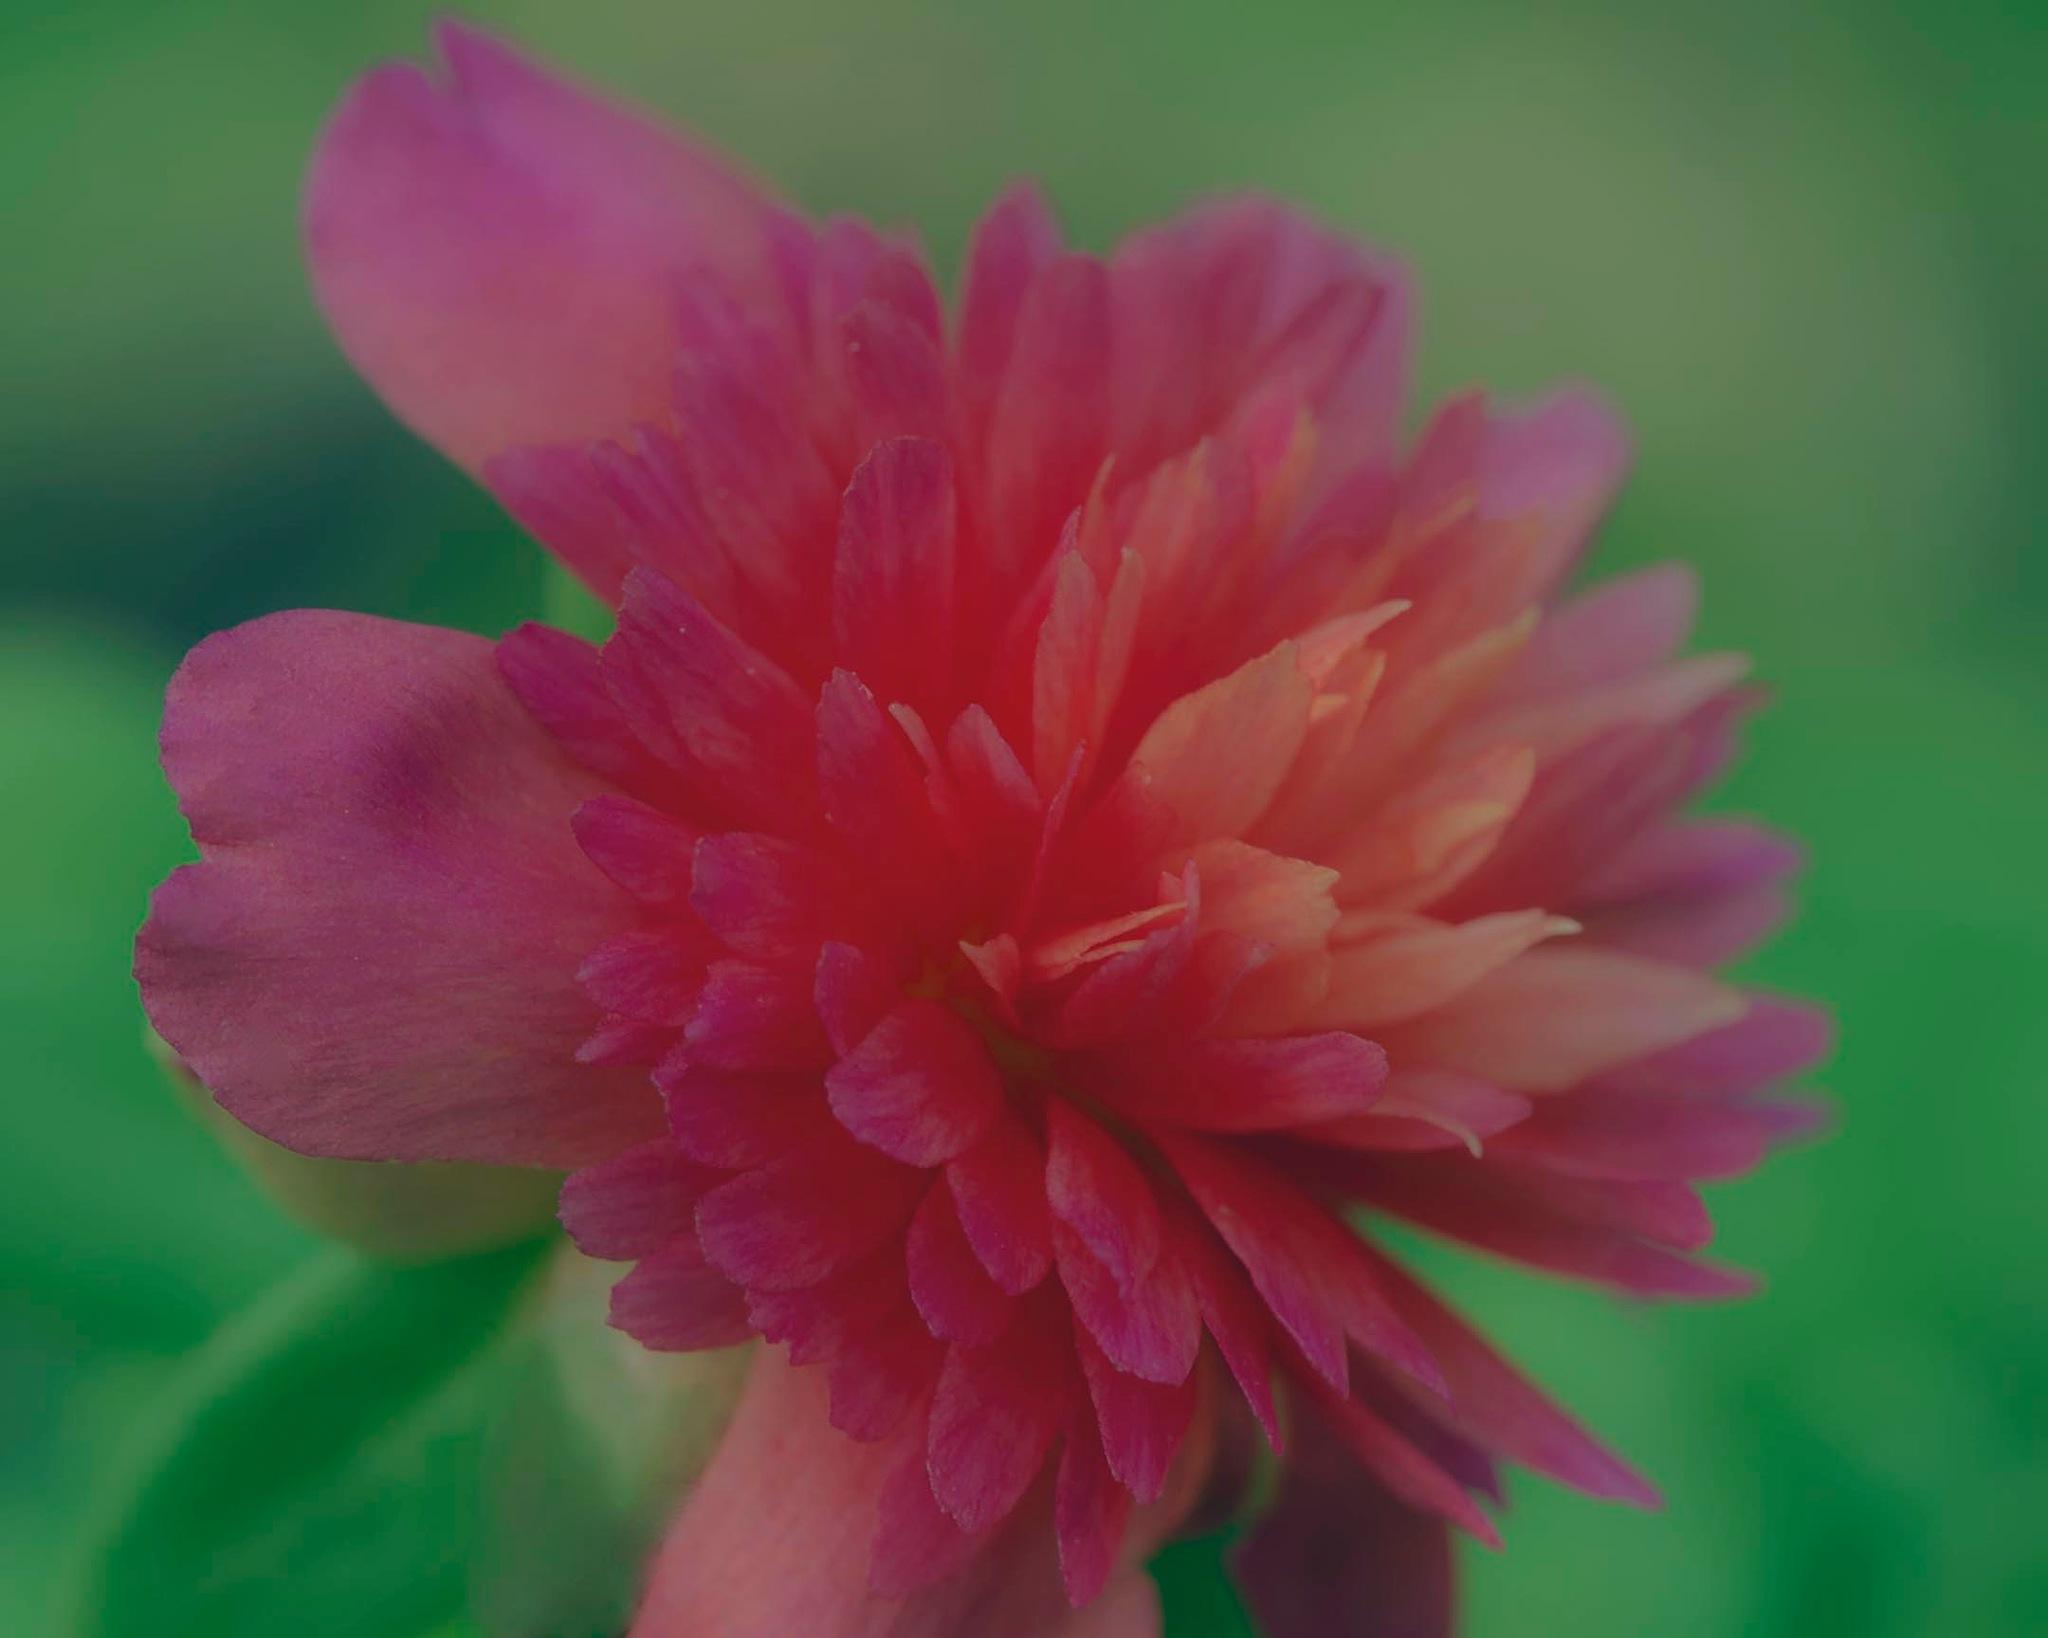 back Yard Flower by BobbyLindley